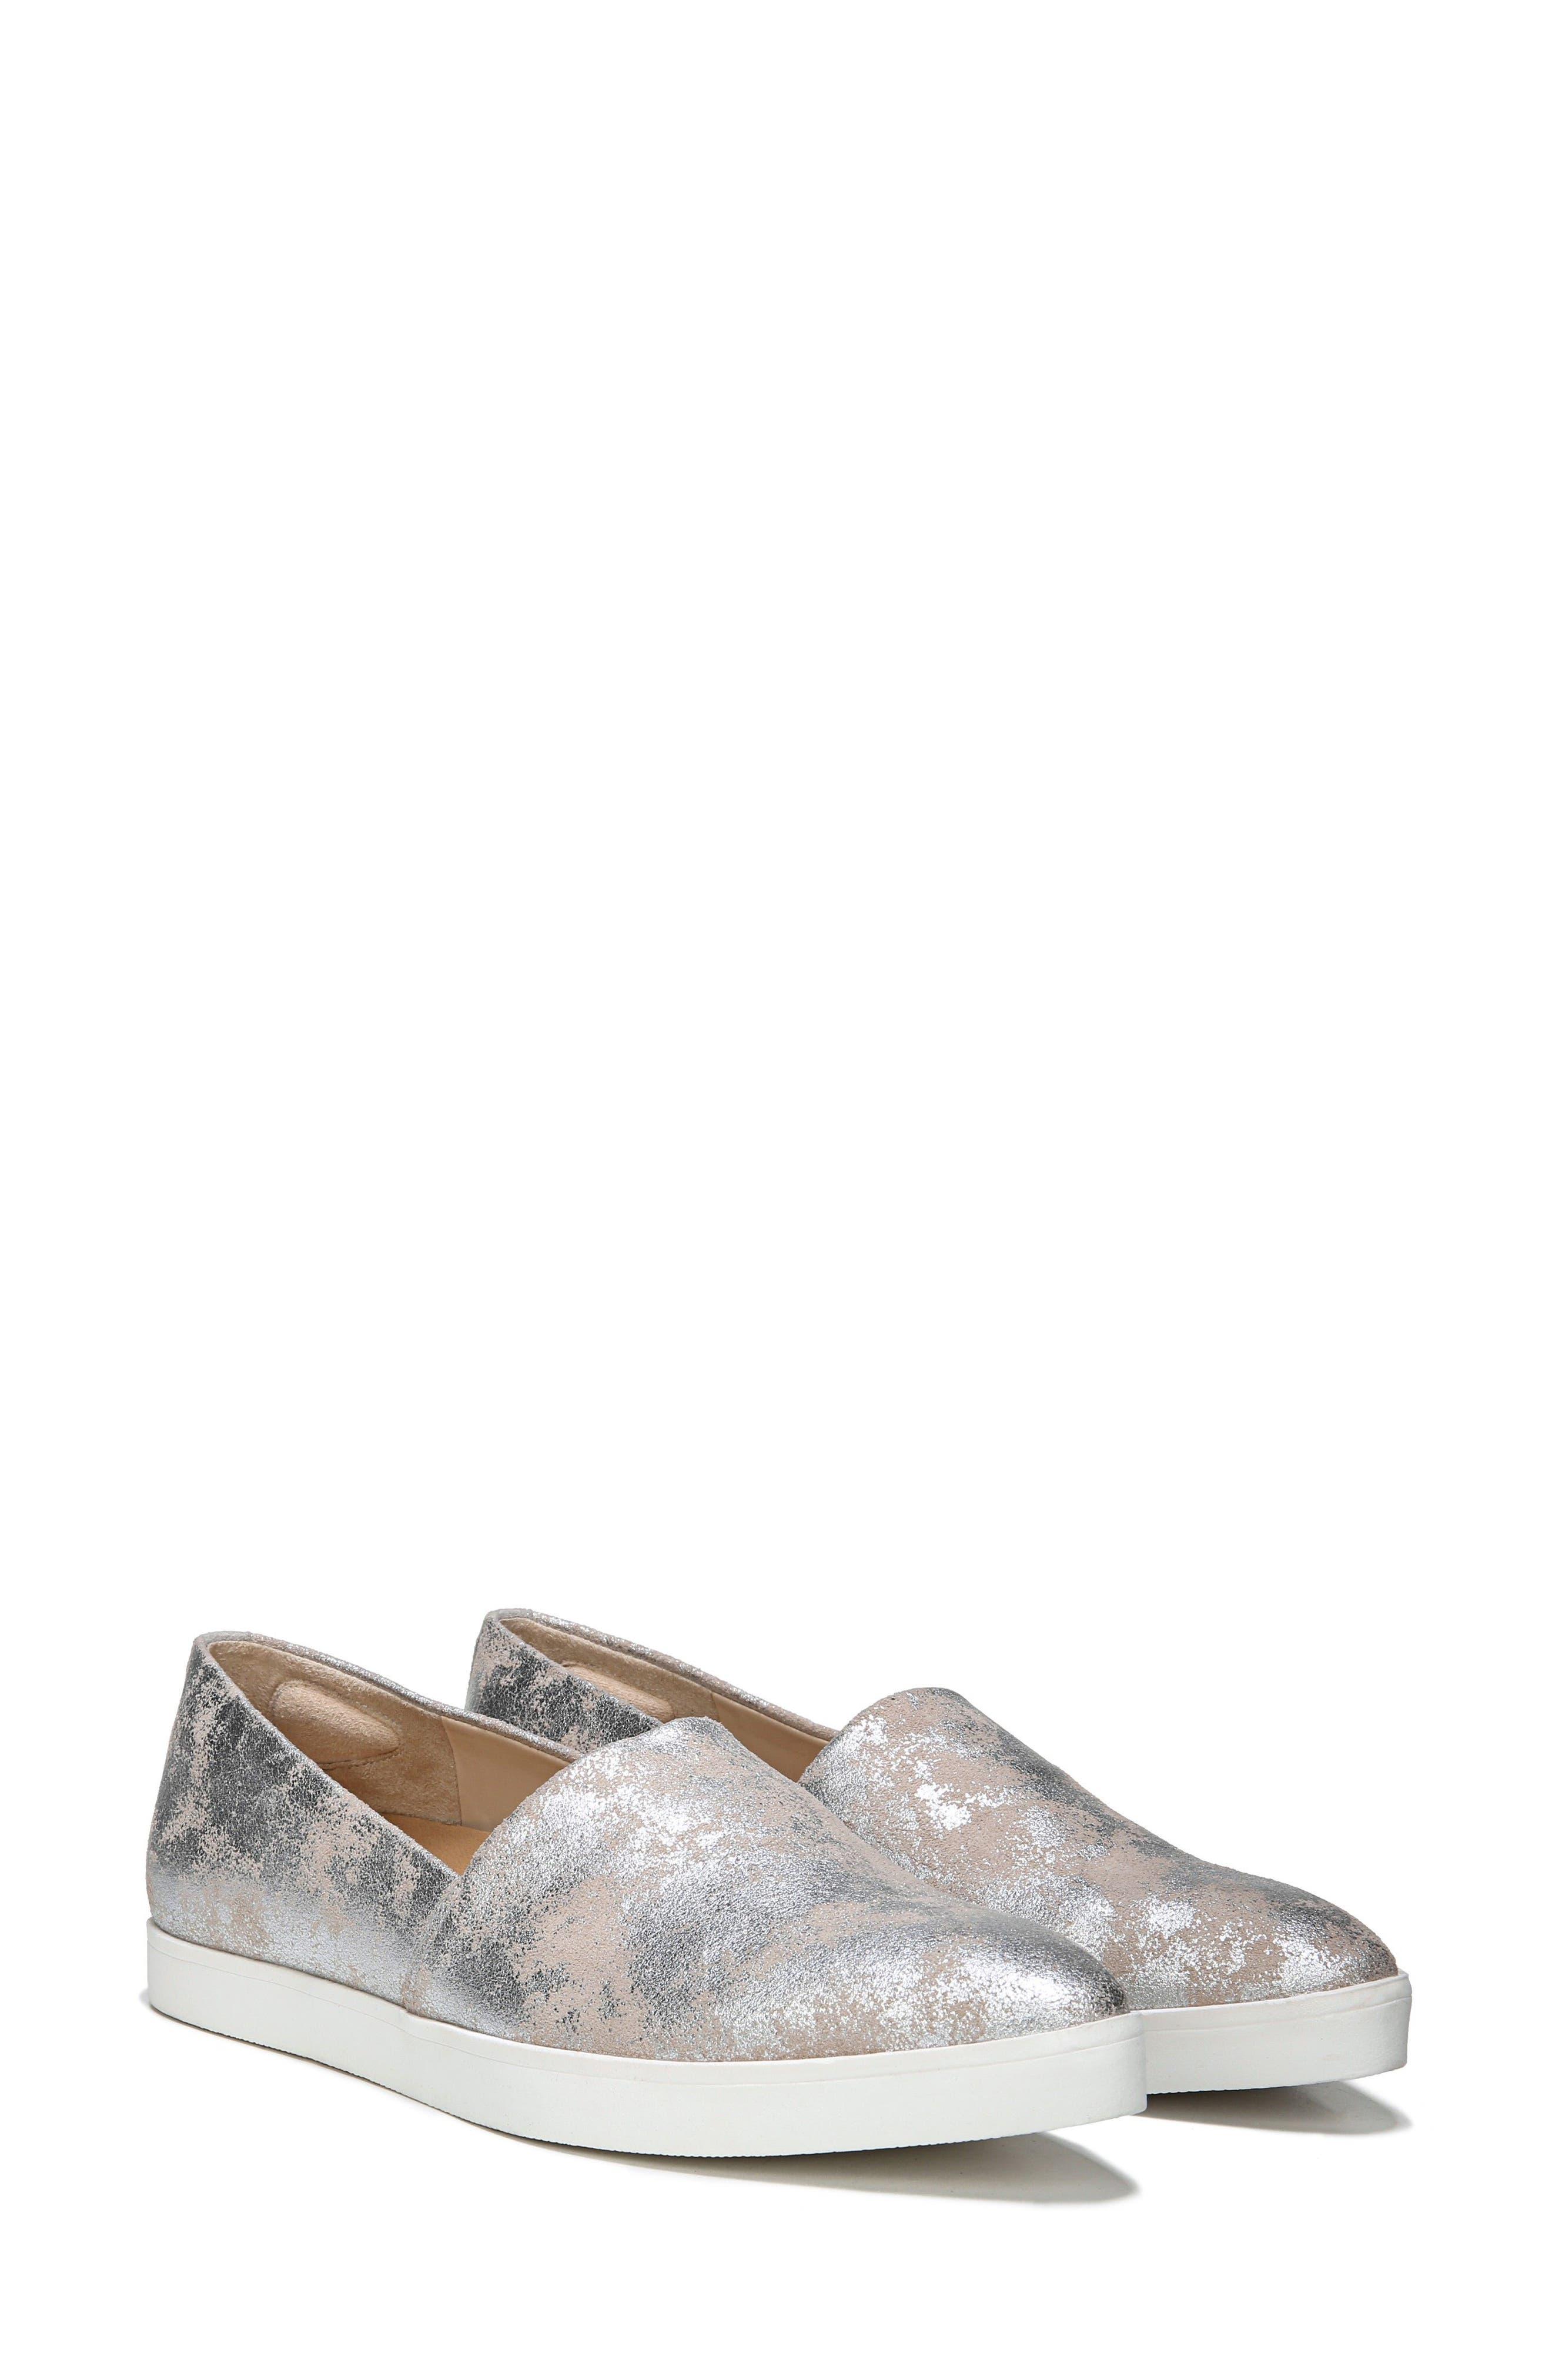 'Vienna' Slip-on Sneaker,                             Alternate thumbnail 8, color,                             040